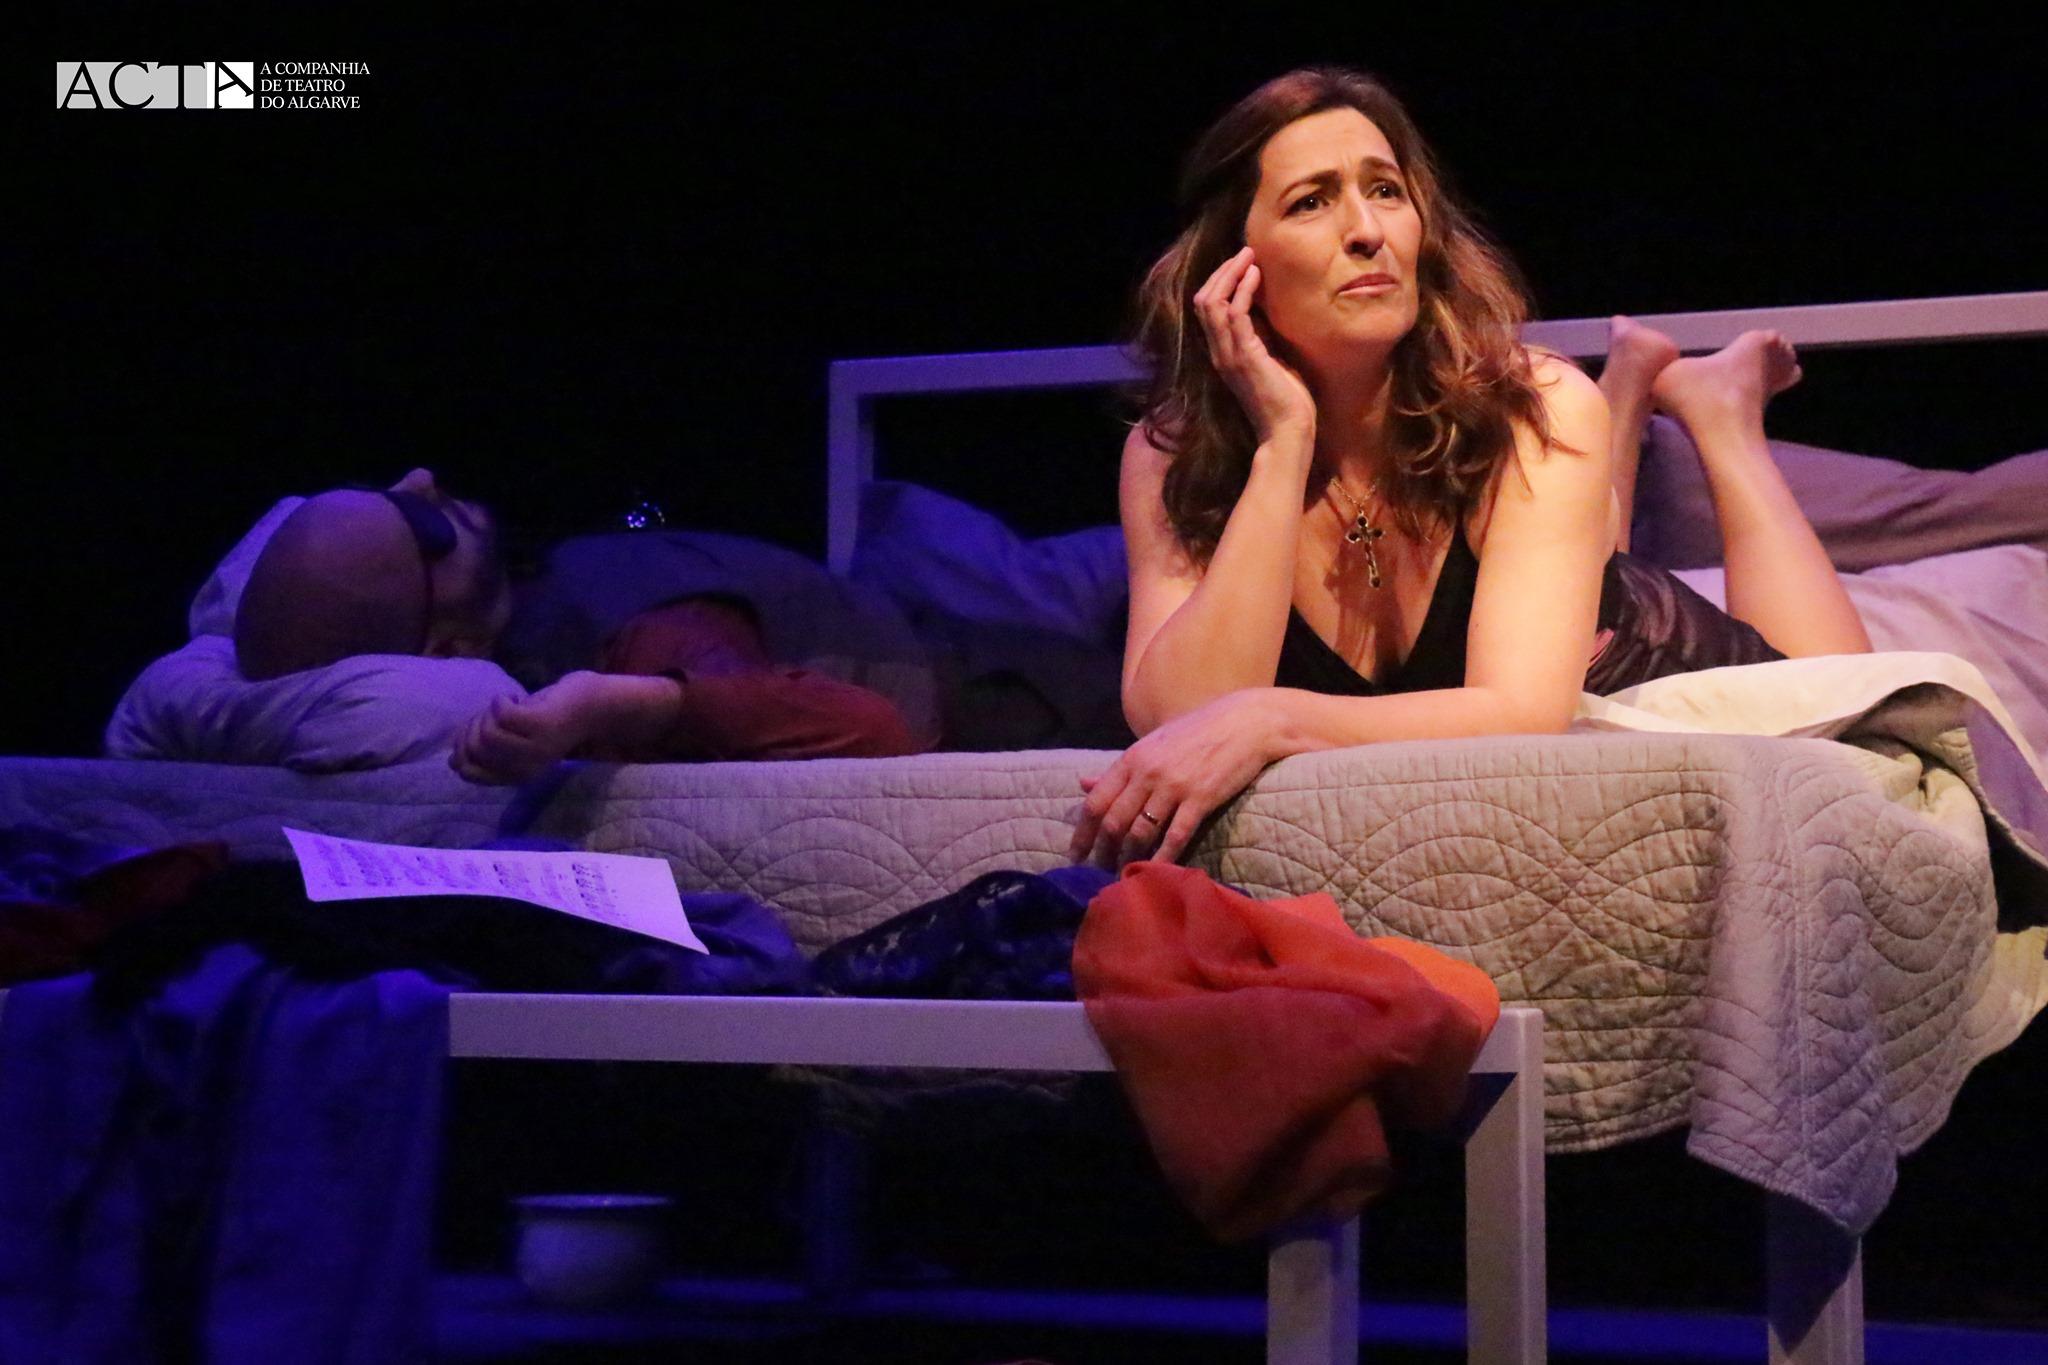 A Noite de Molly Bloom - A Companhia de Teatro do Algarve (ACTA)